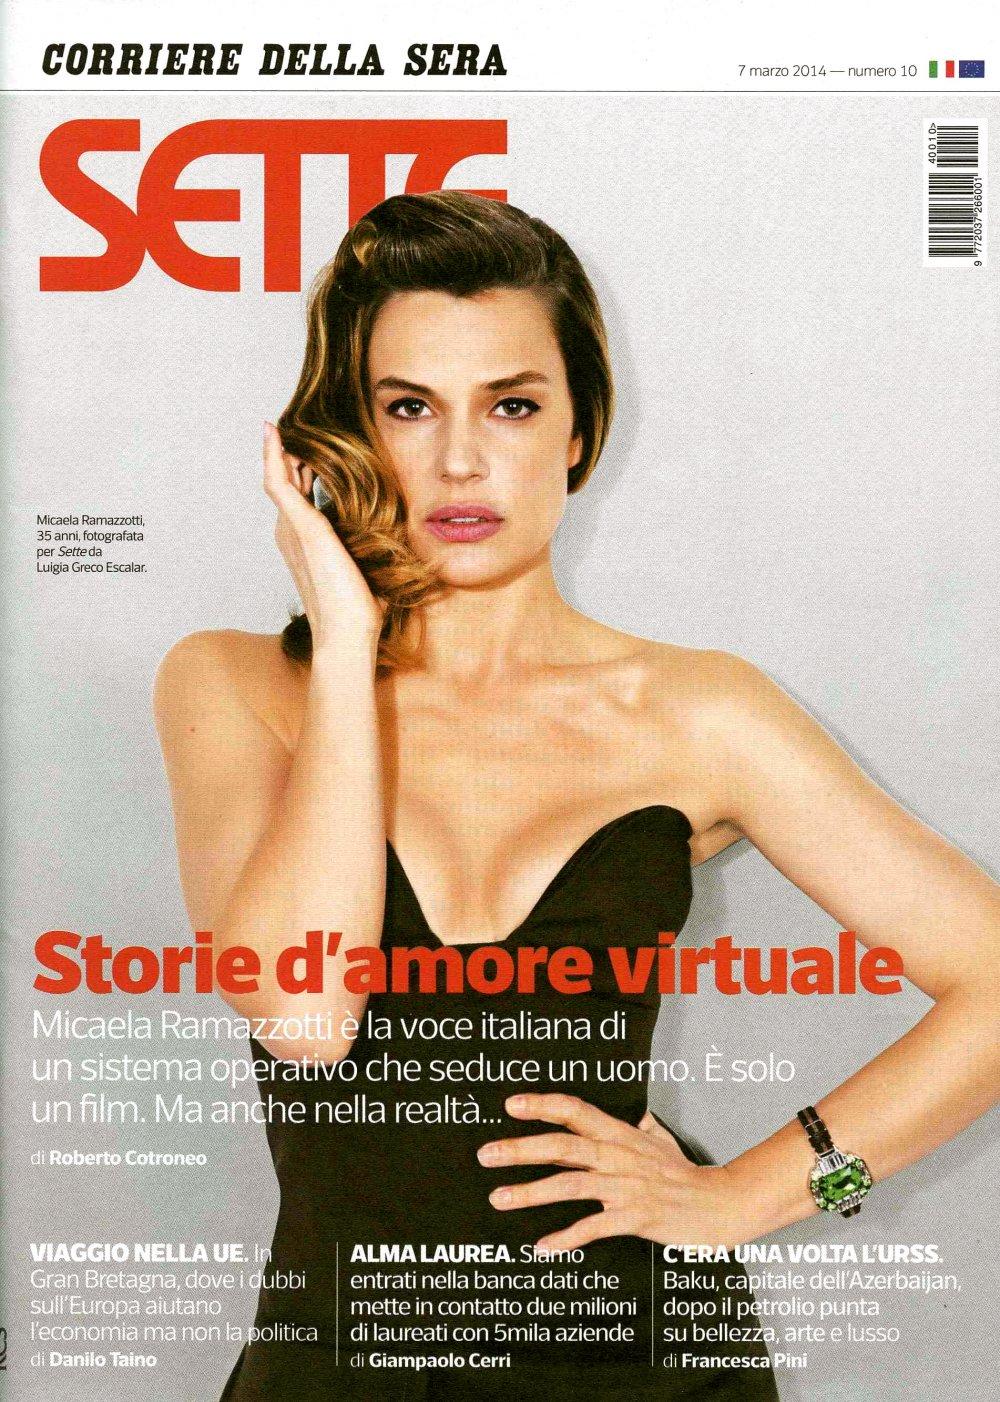 Communication on this topic: Elisa Gabrielli, minaei-noji-born-september-30-1973-age/